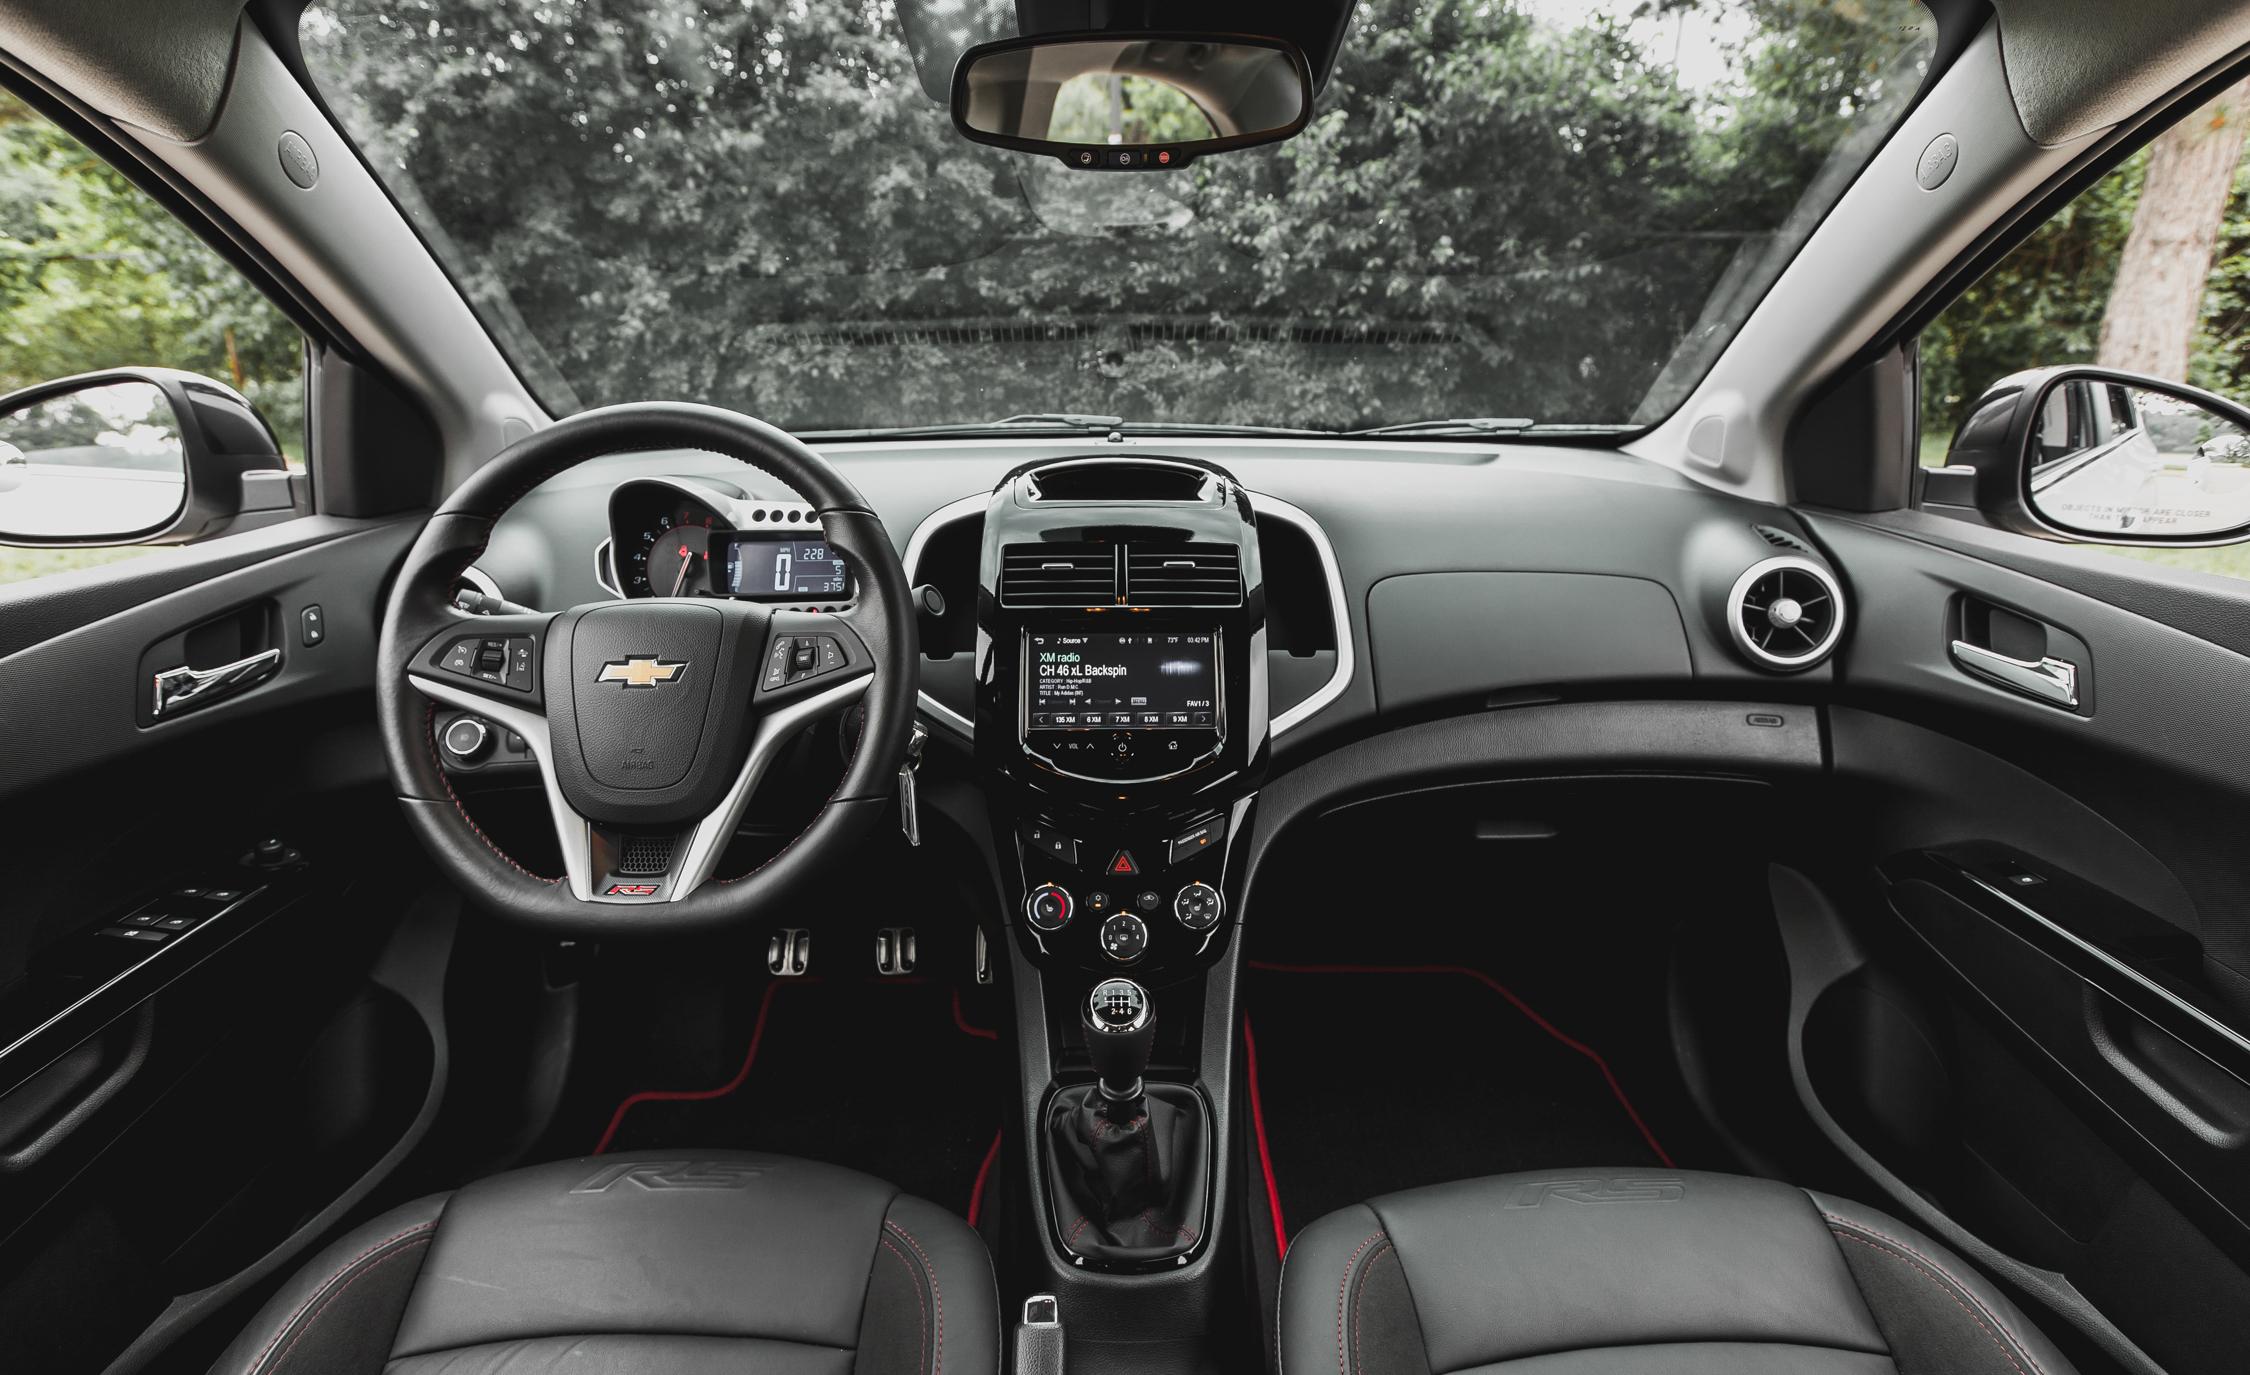 2014 Chevrolet Sonic RS Sedan Interior (View 19 of 27)